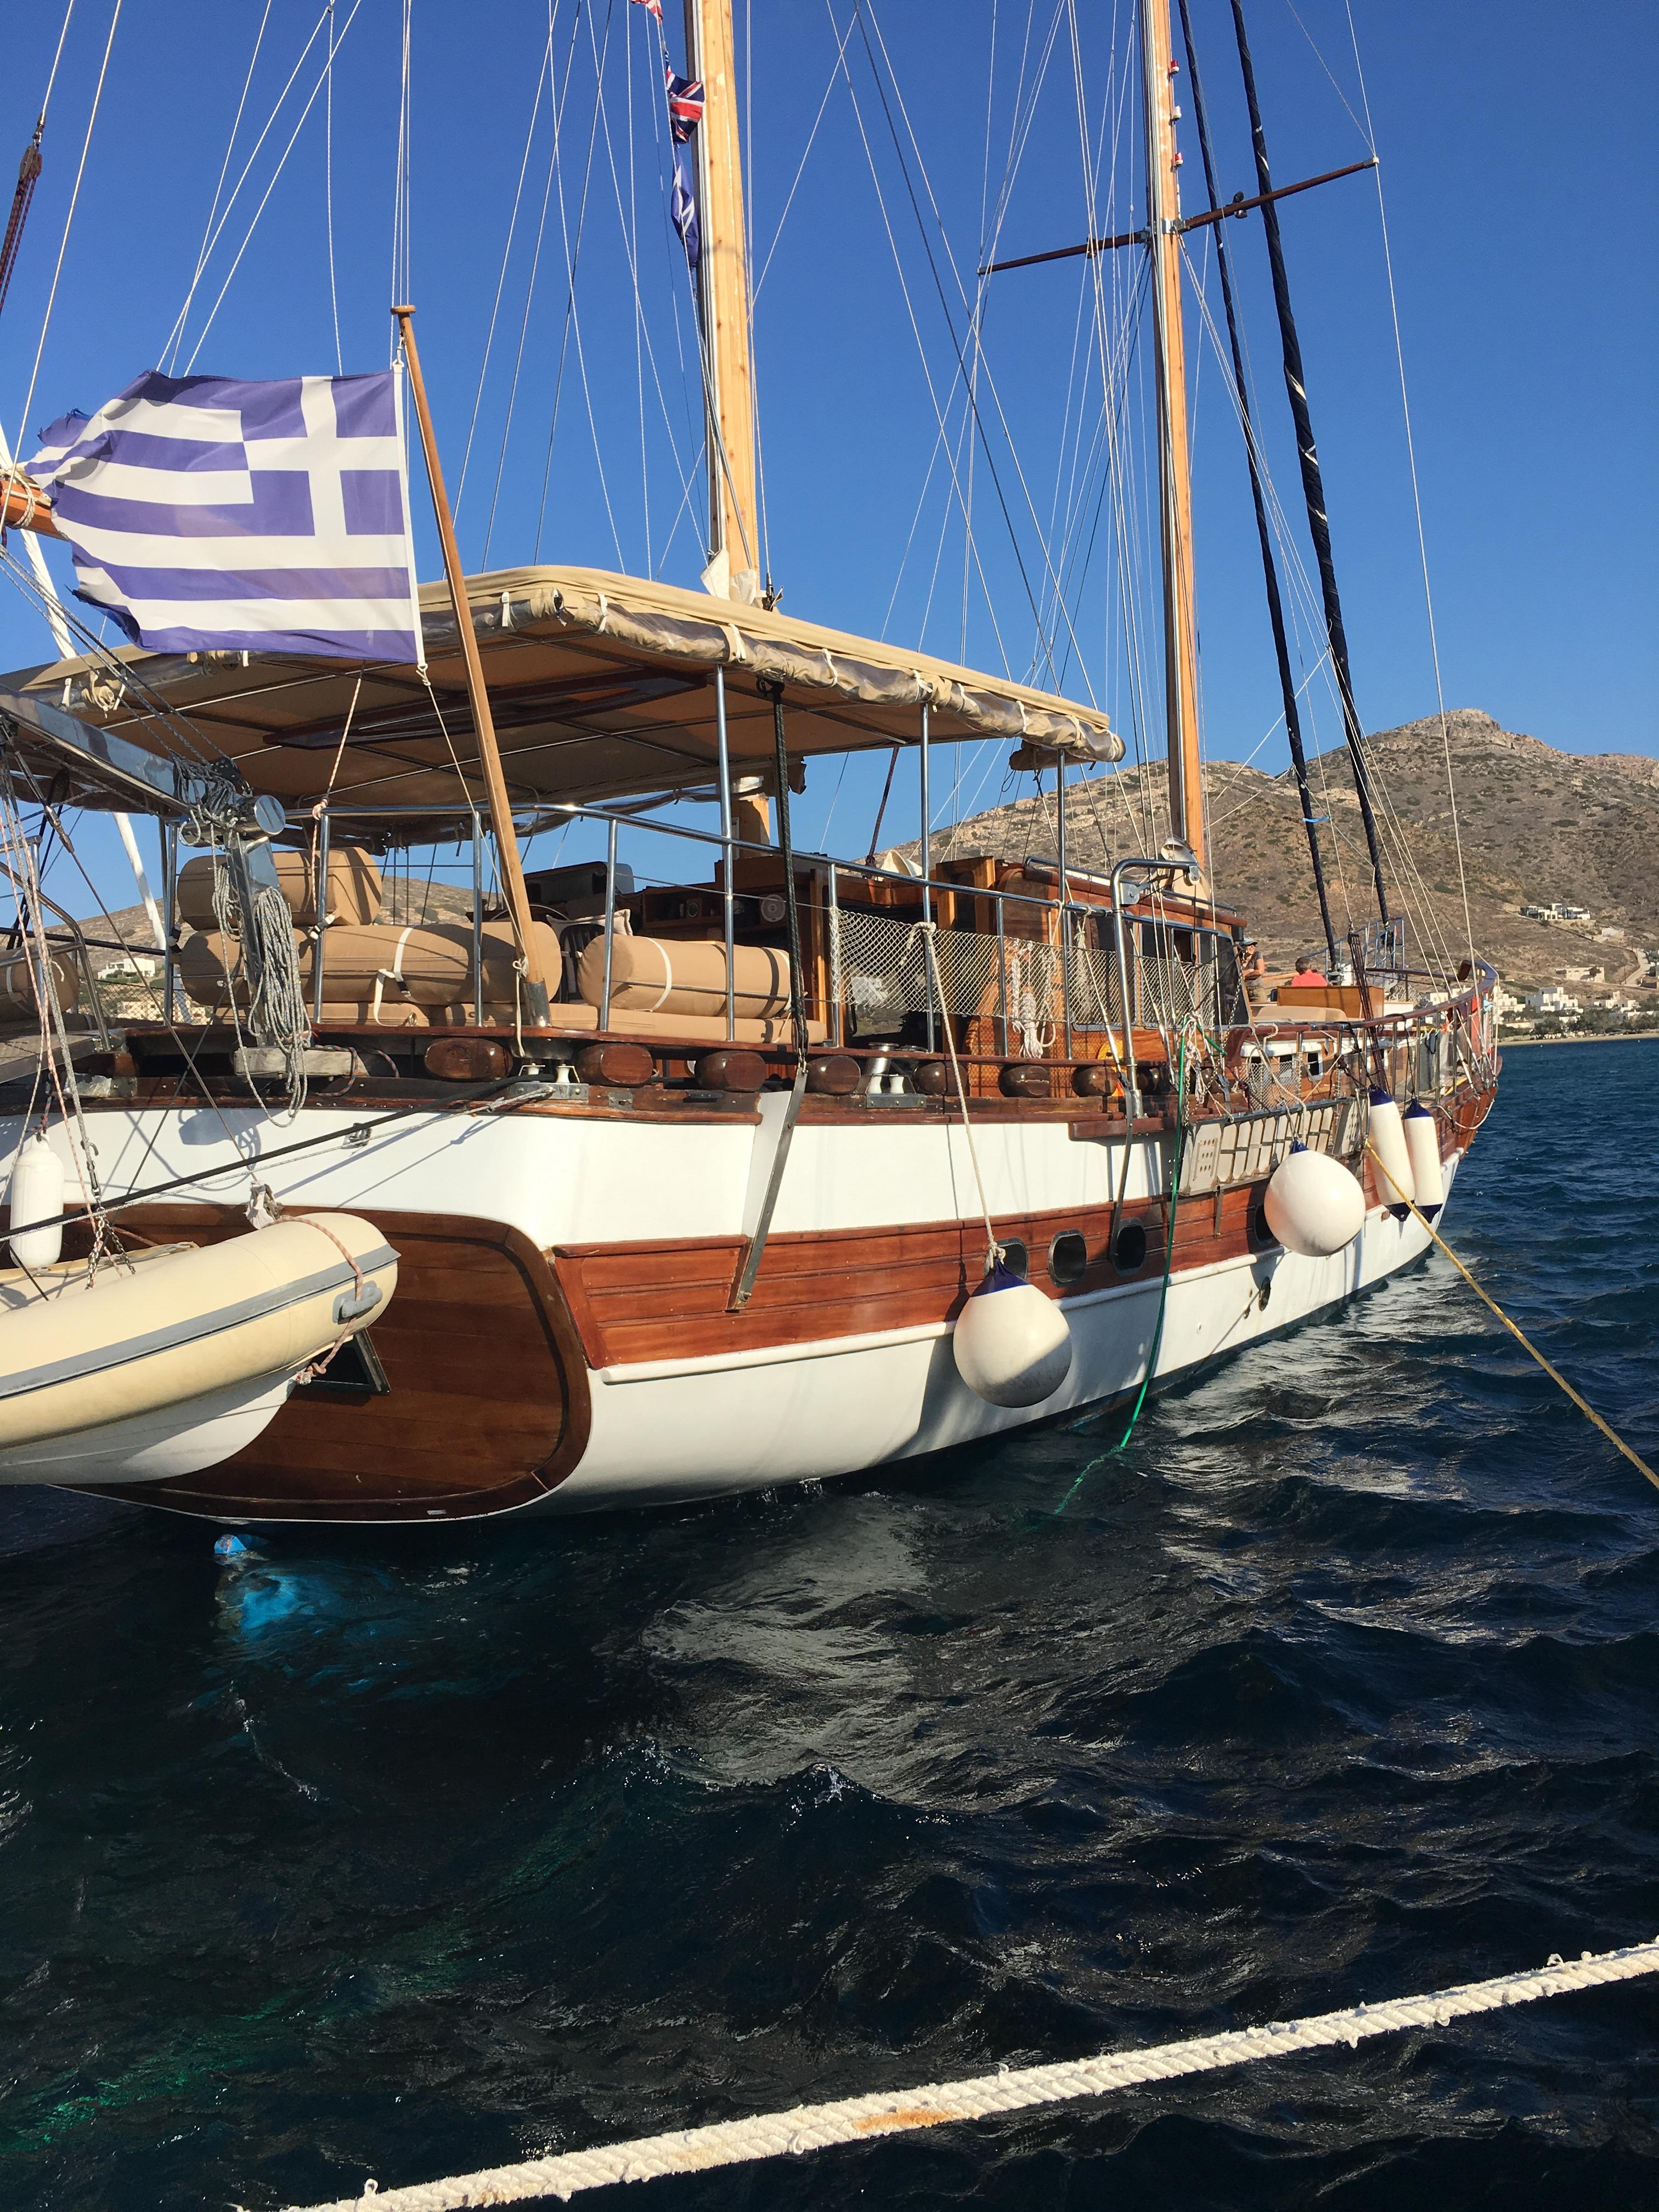 Greece by Sail - Kapitan Kosmos our traditional timber sailing boat